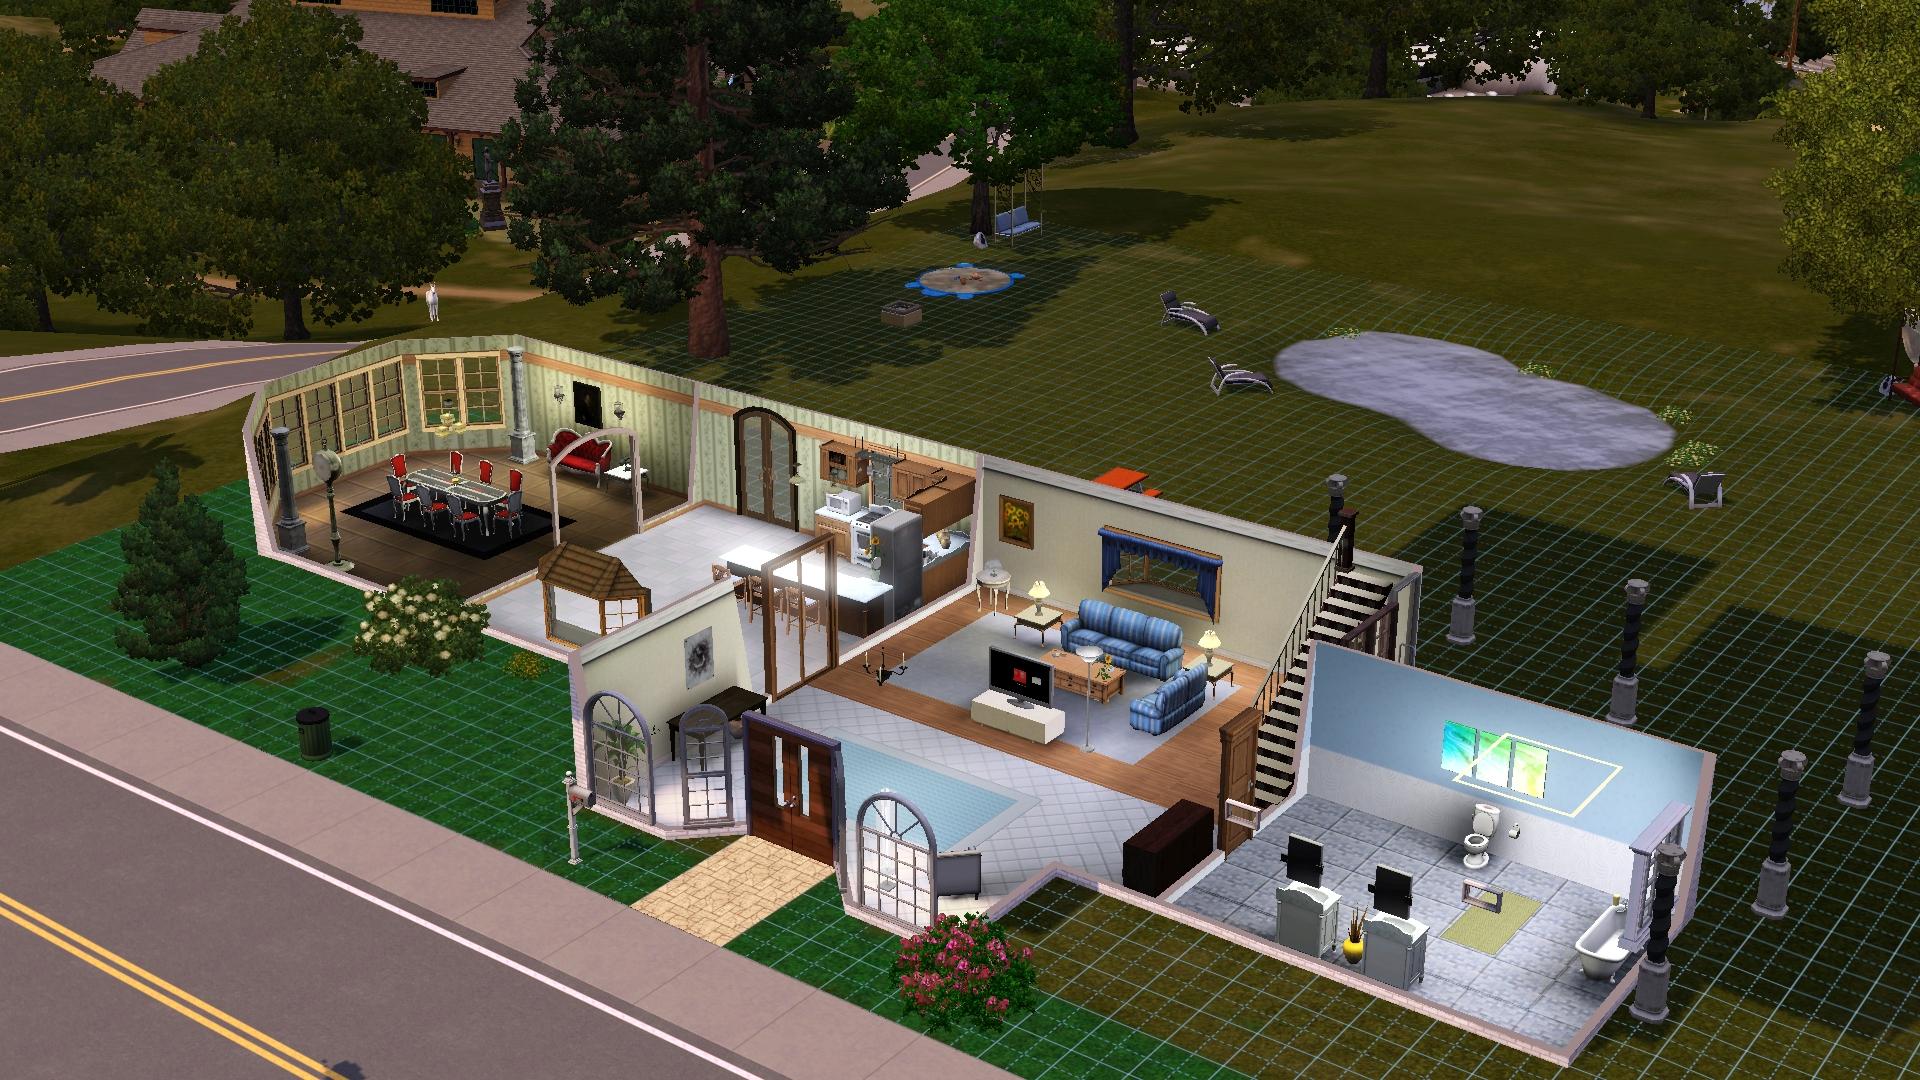 Sims 3 House Plans Xbox 360